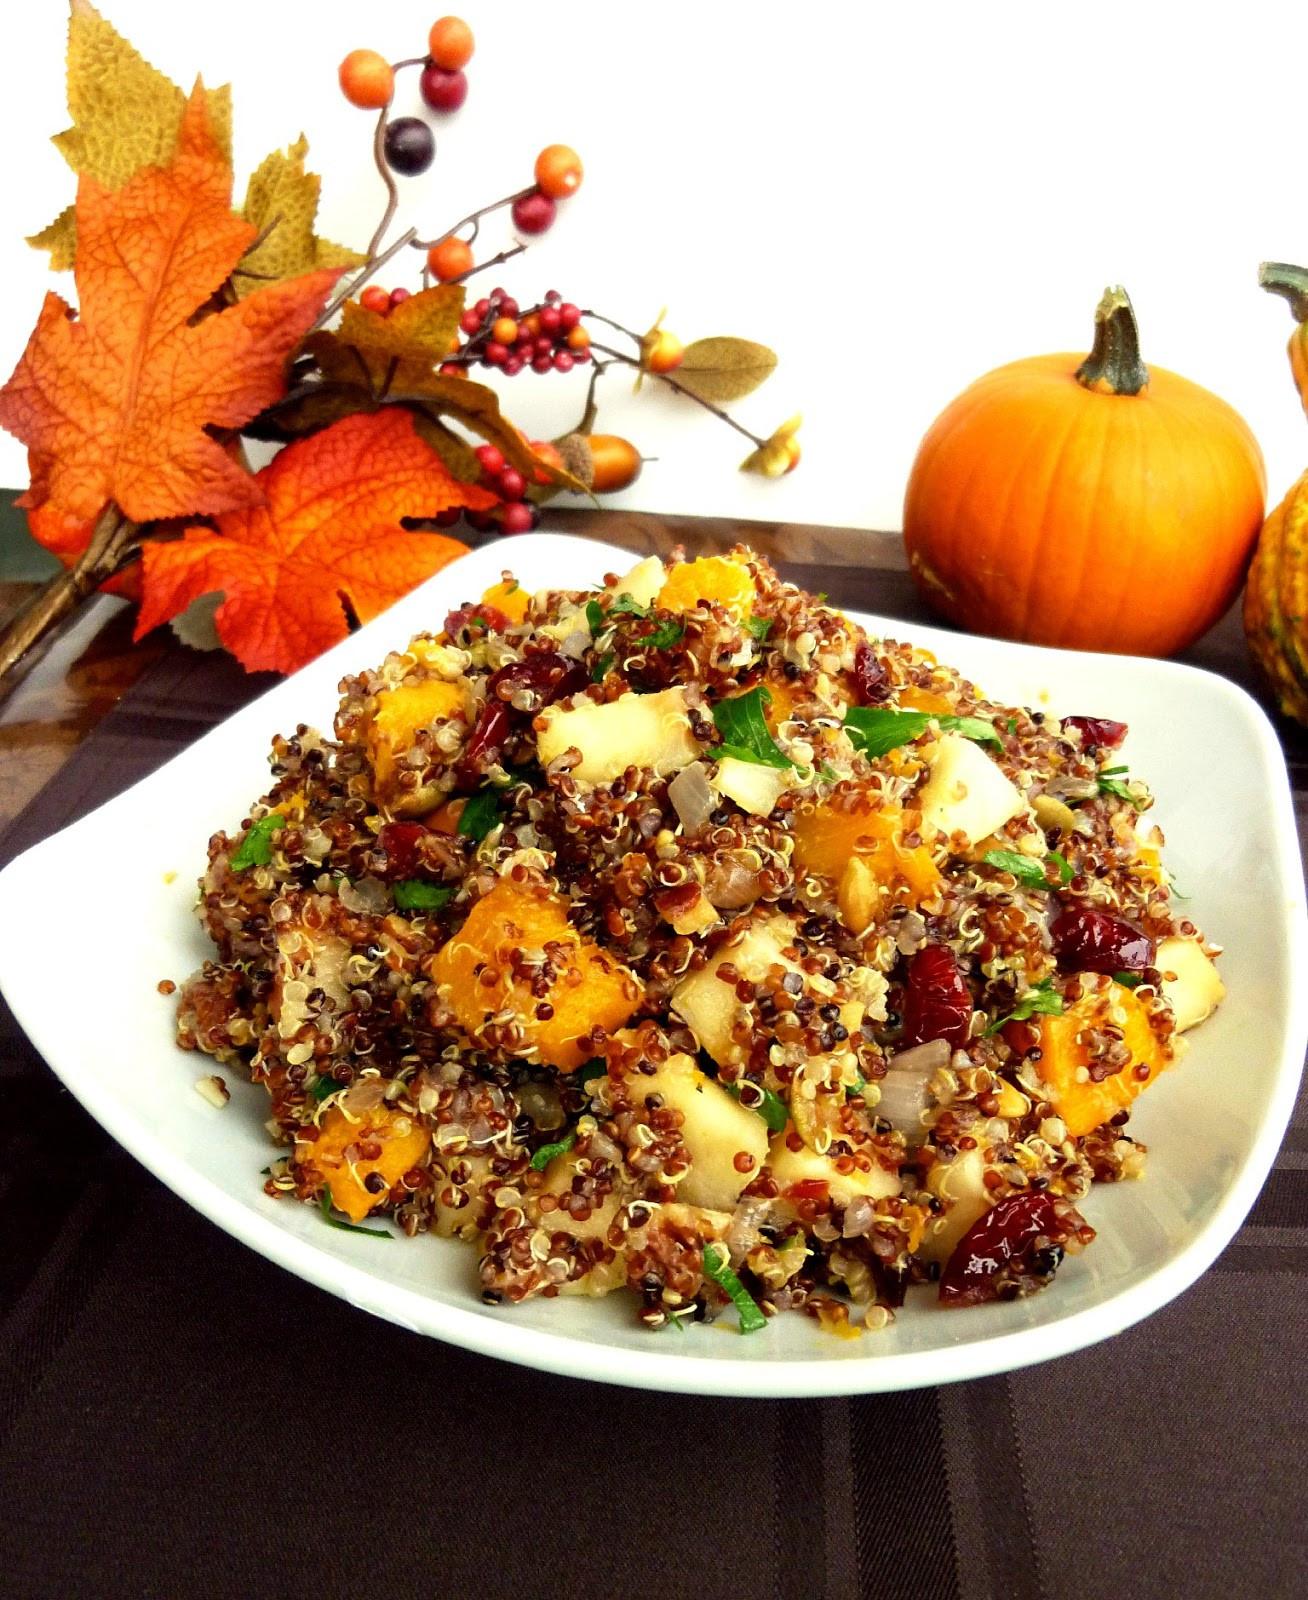 Vegetarian Thanksgiving Recipes Main Dish  Vanilla & Spice Recipes for a Ve arian Thanksgiving